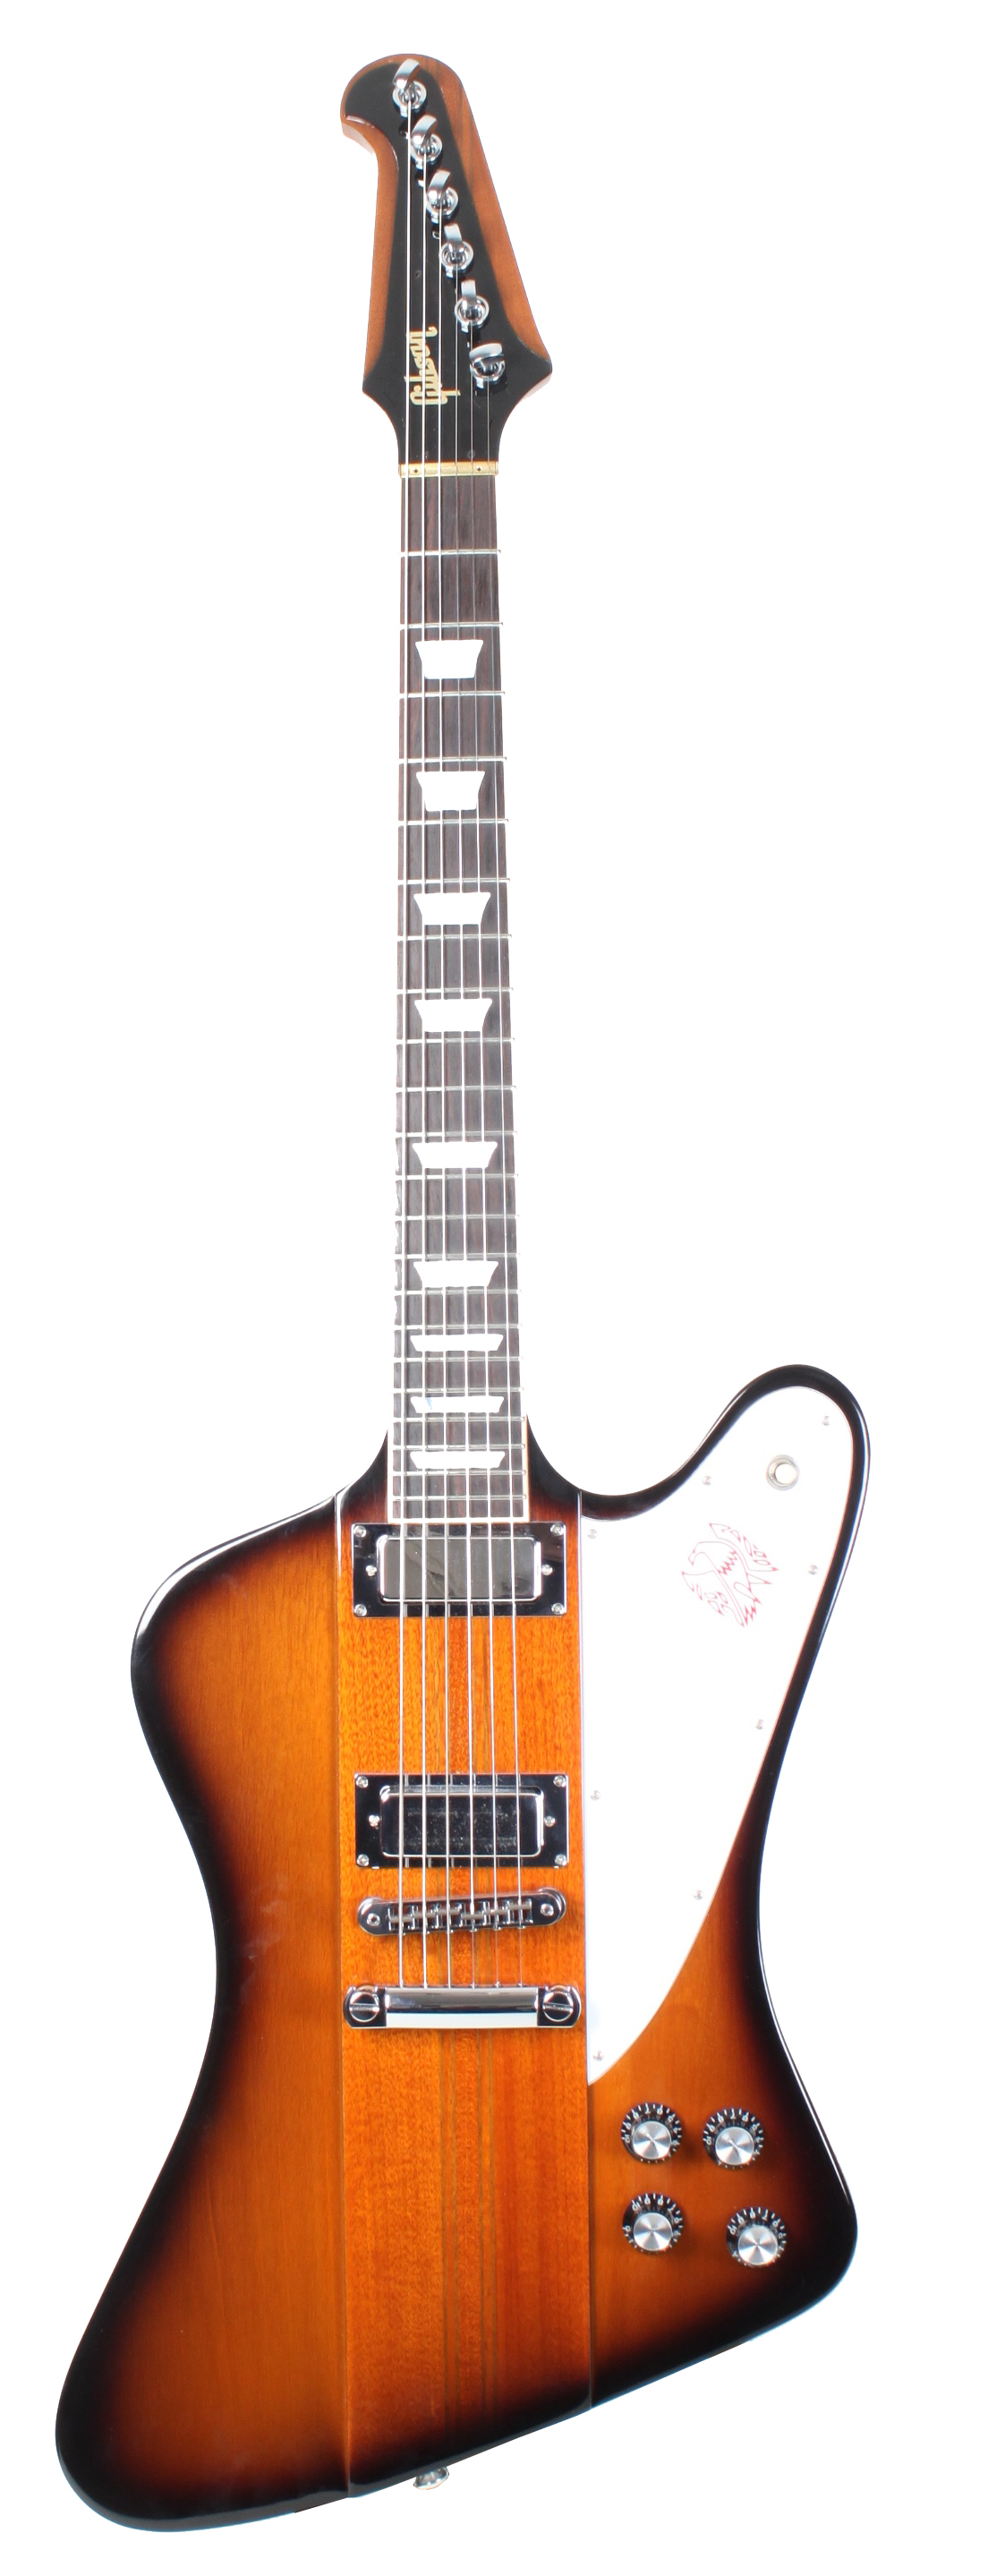 gibson firebird 2015 sunburst mj guitars. Black Bedroom Furniture Sets. Home Design Ideas